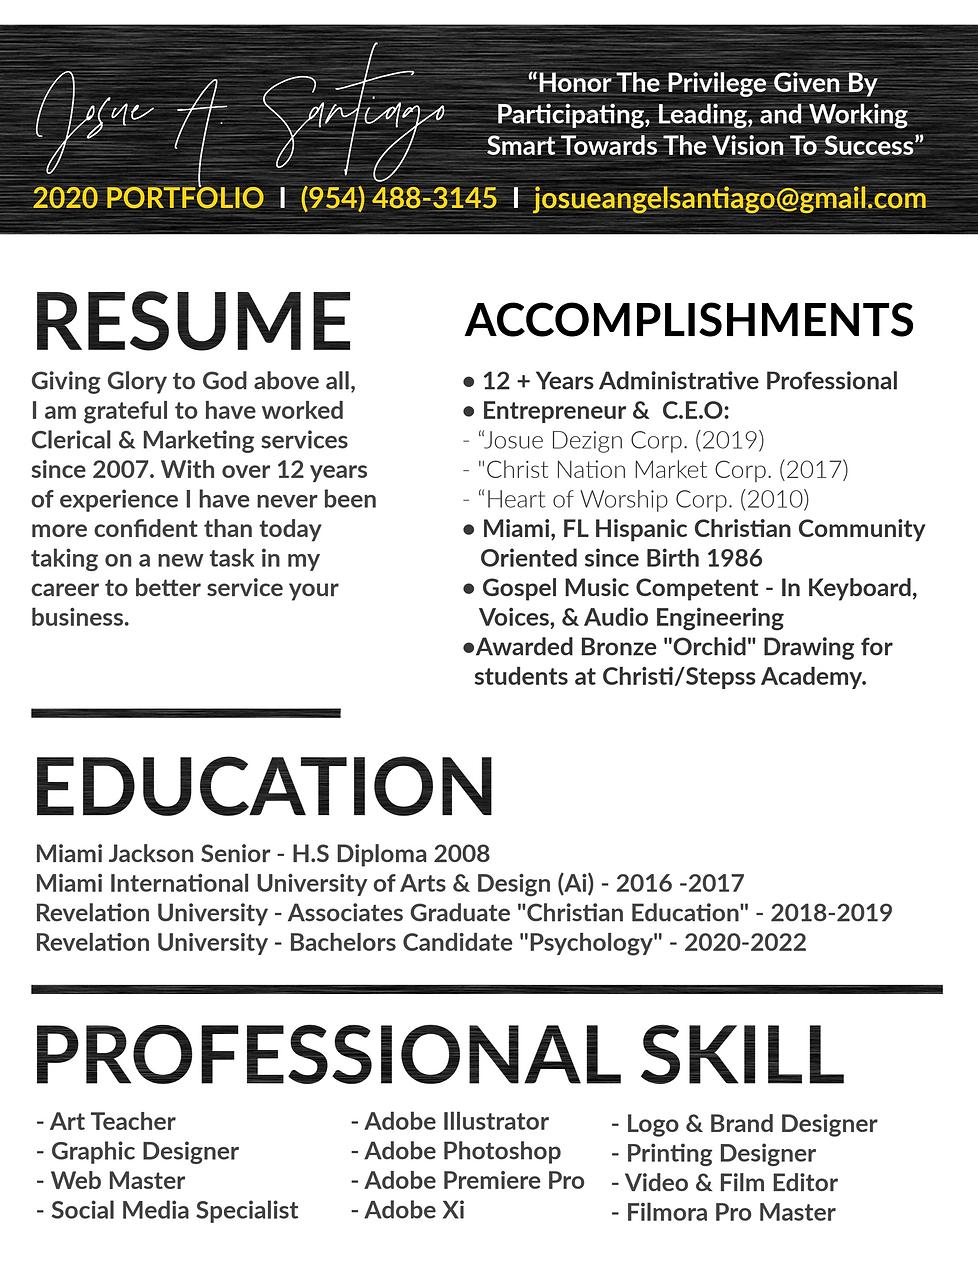 Josue A. Santiago Resume 2020 Pg 1.png